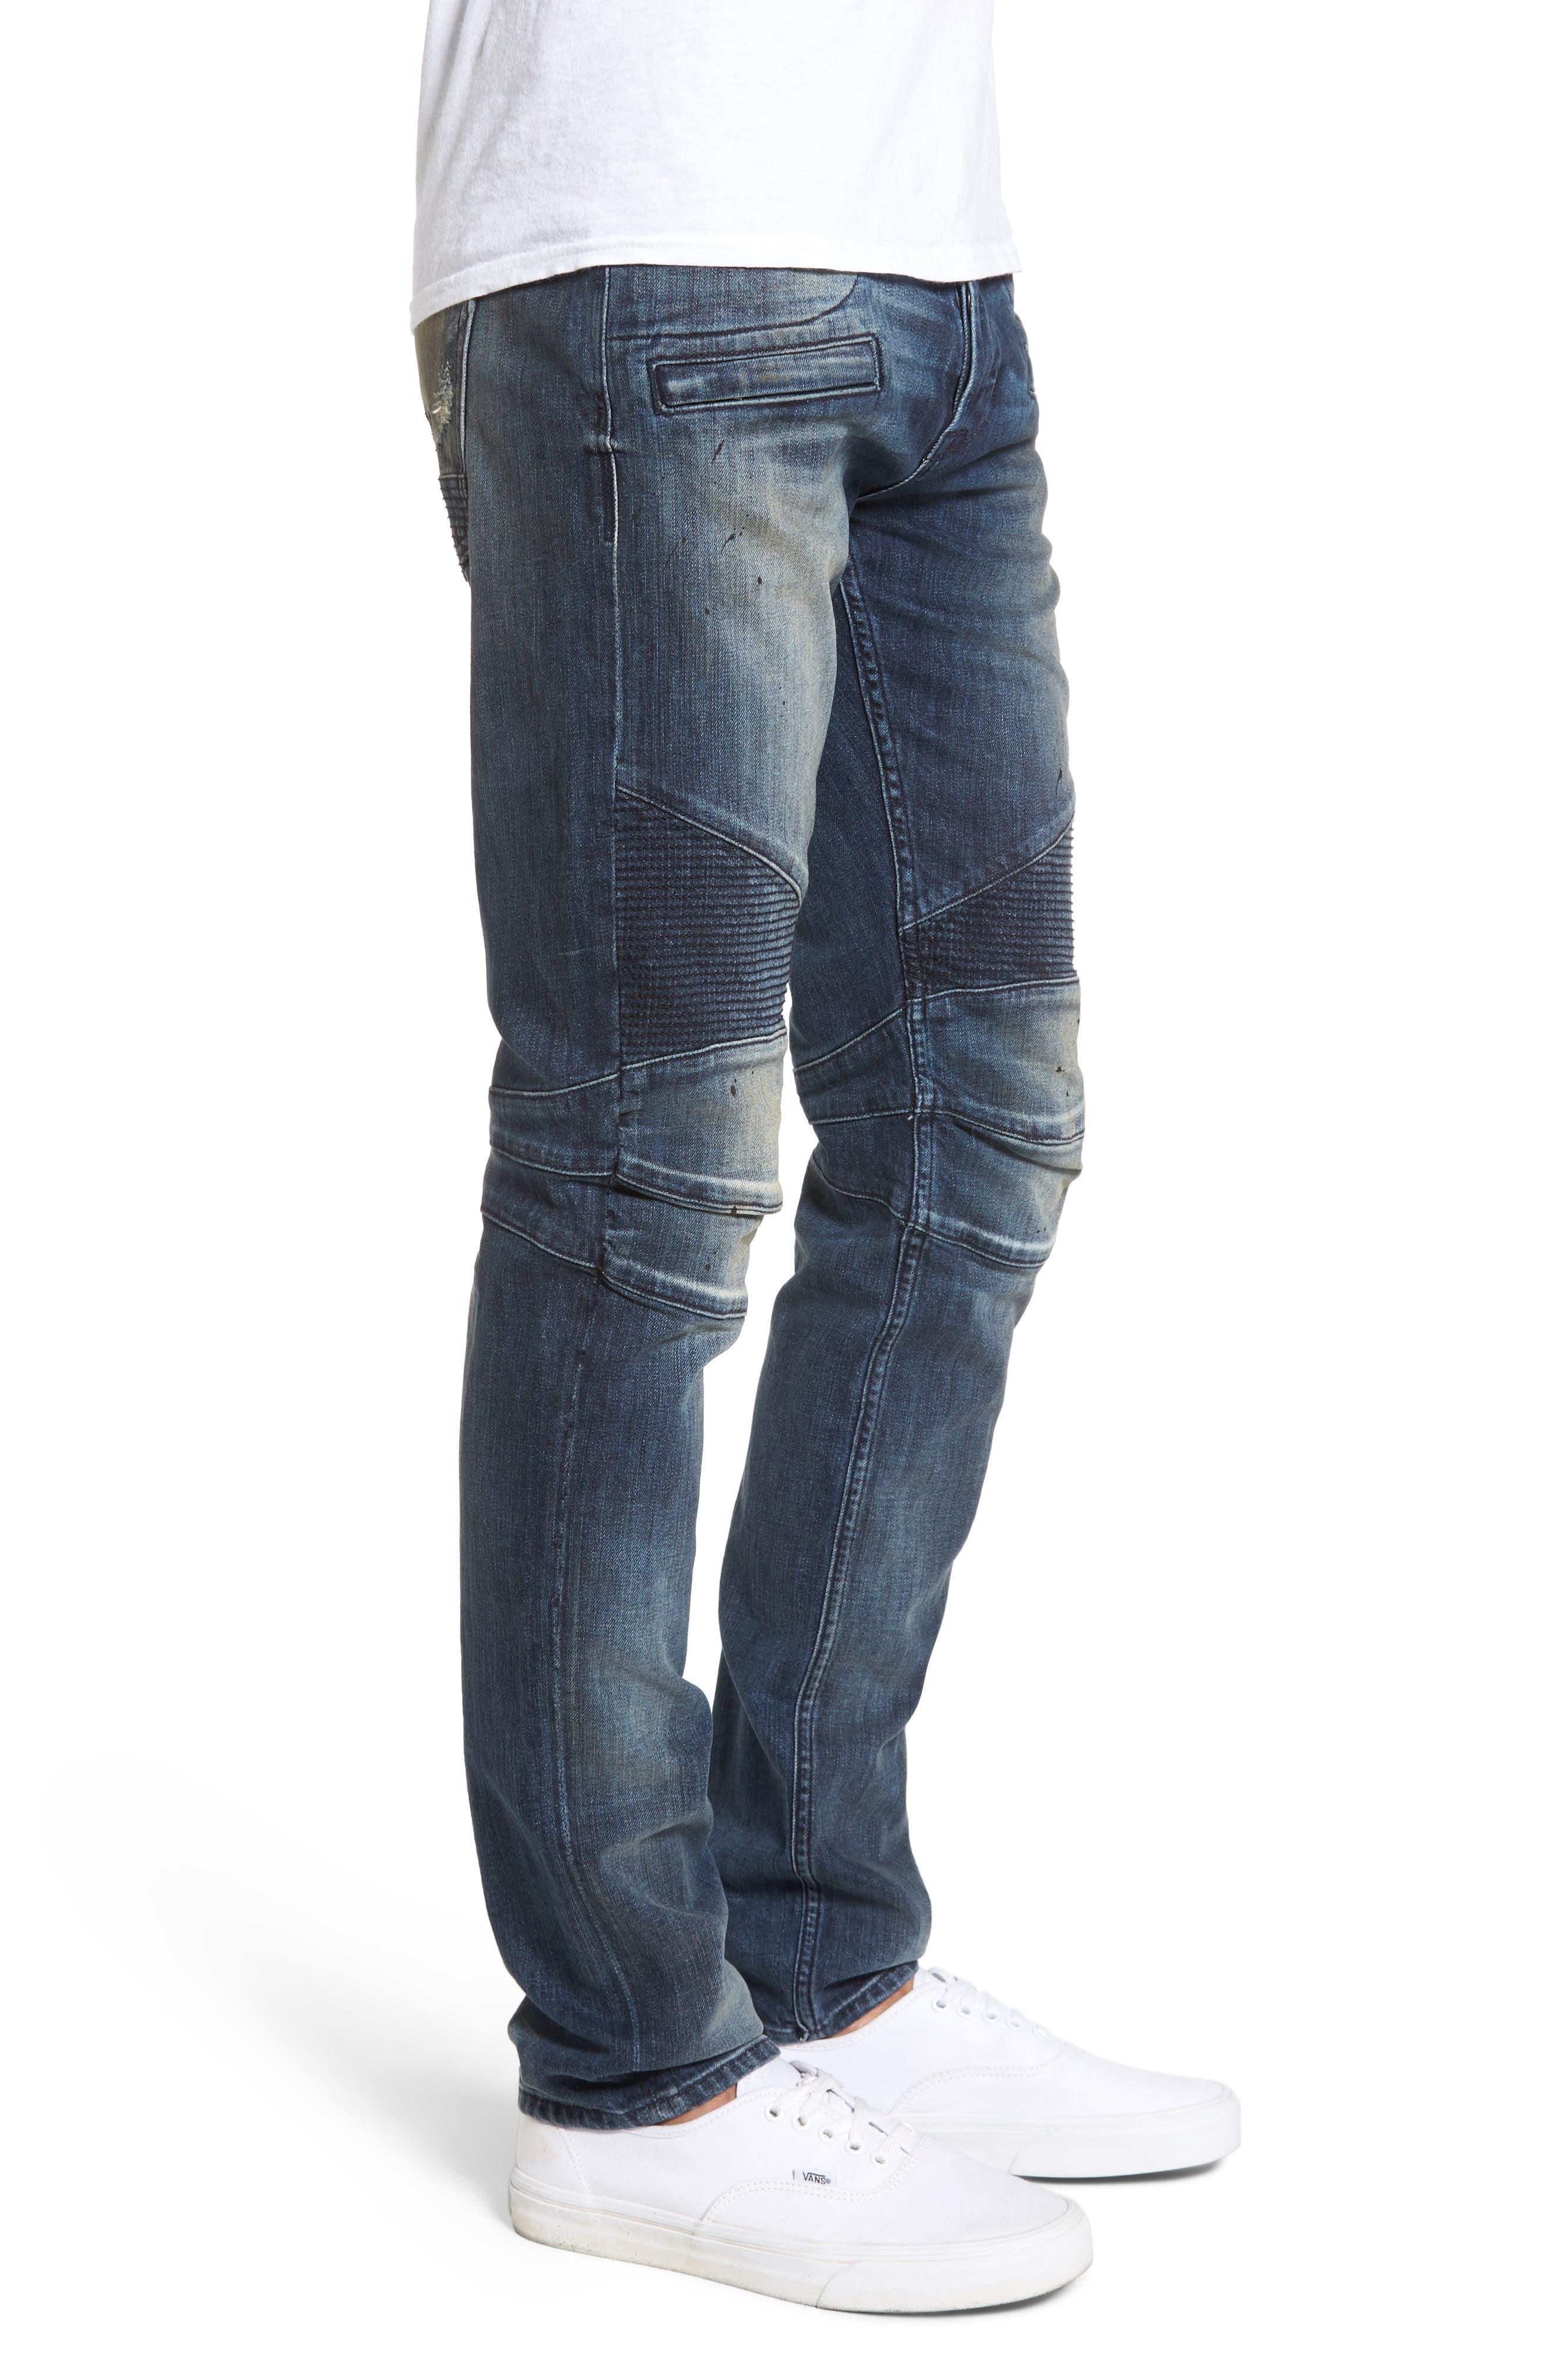 Blinder Biker Moto Skinny Fit Jeans,                             Alternate thumbnail 3, color,                             425